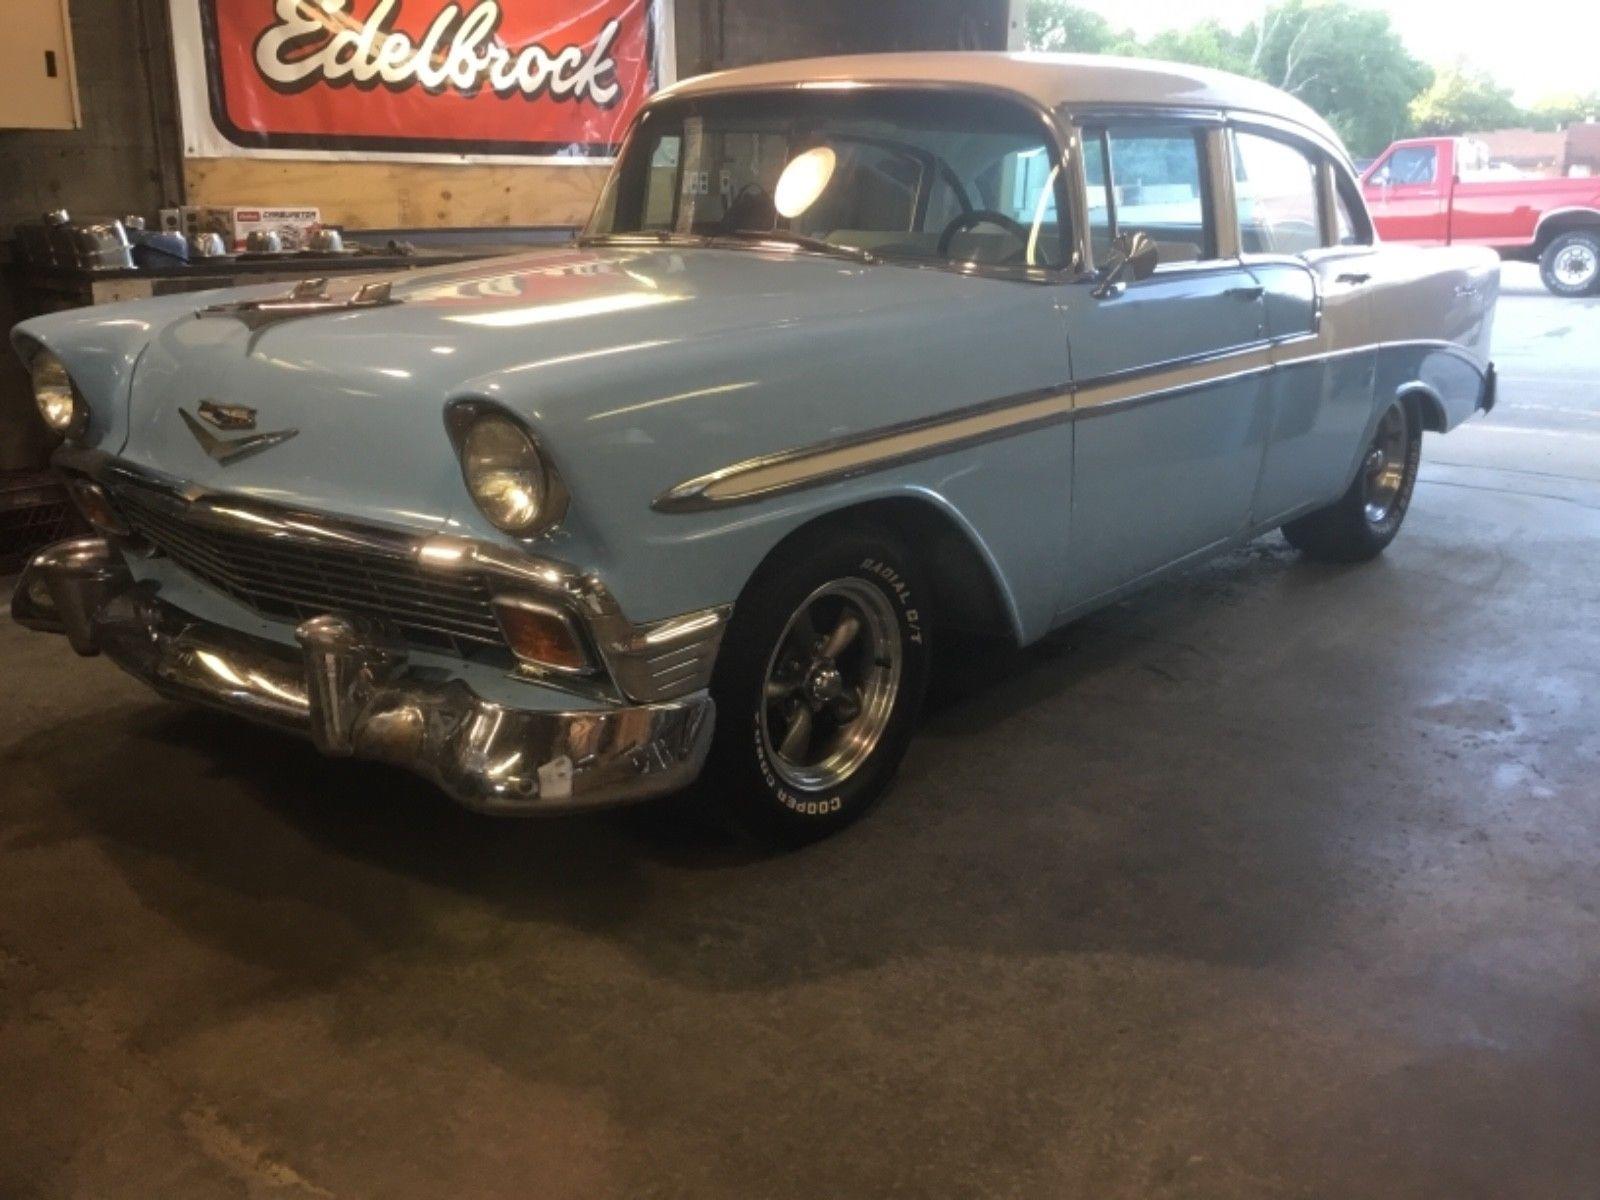 Awesome 1956 Chevrolet Bel Air 150 210 Bel Air 56 Bel Air Cruiser 2019